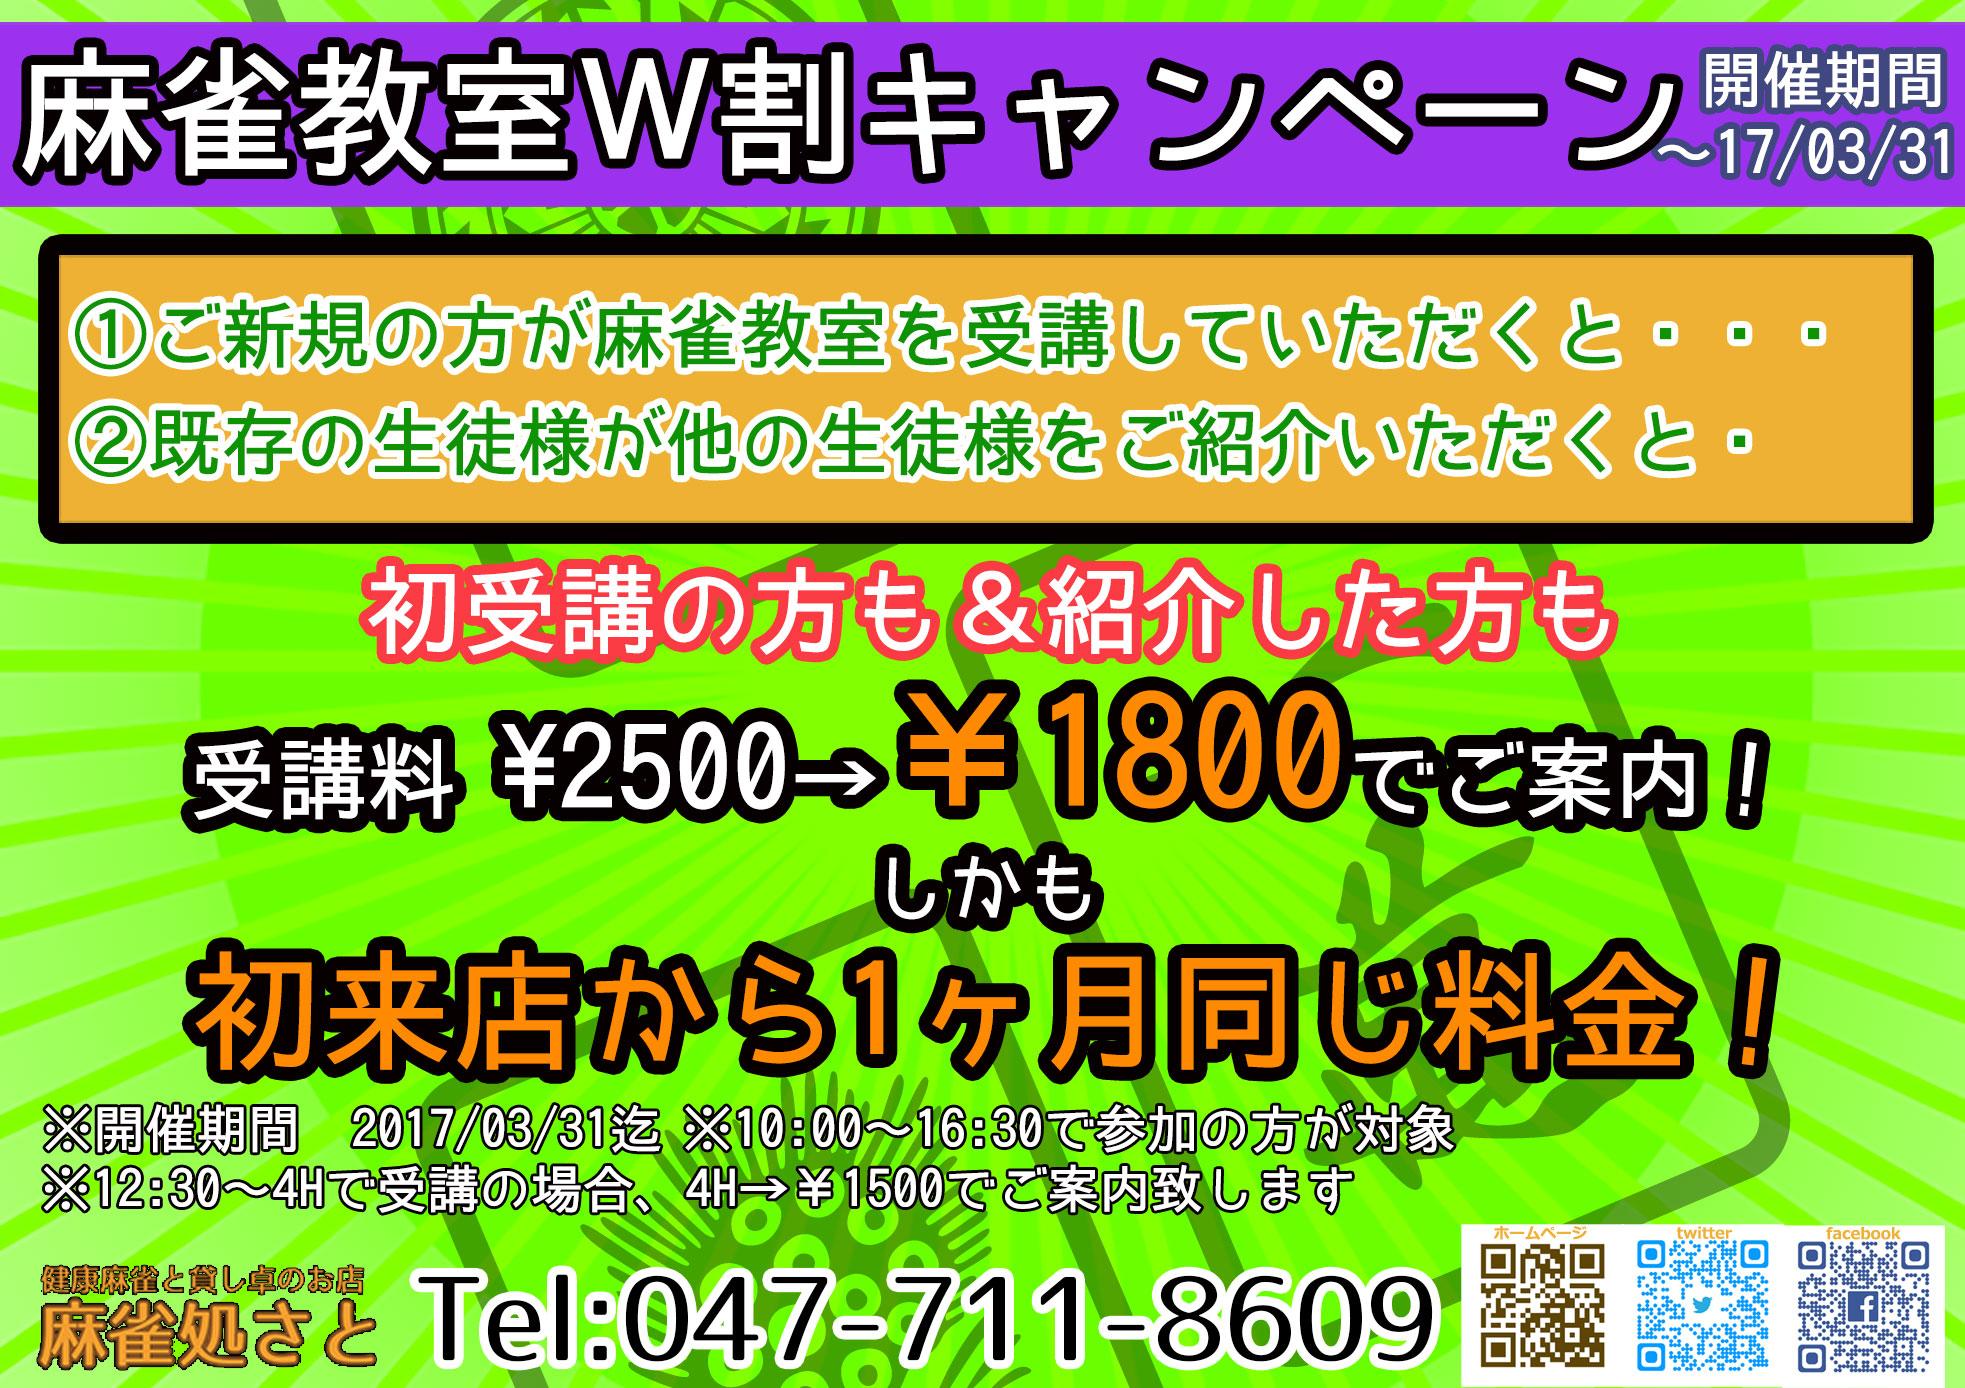 ma-jan-event2